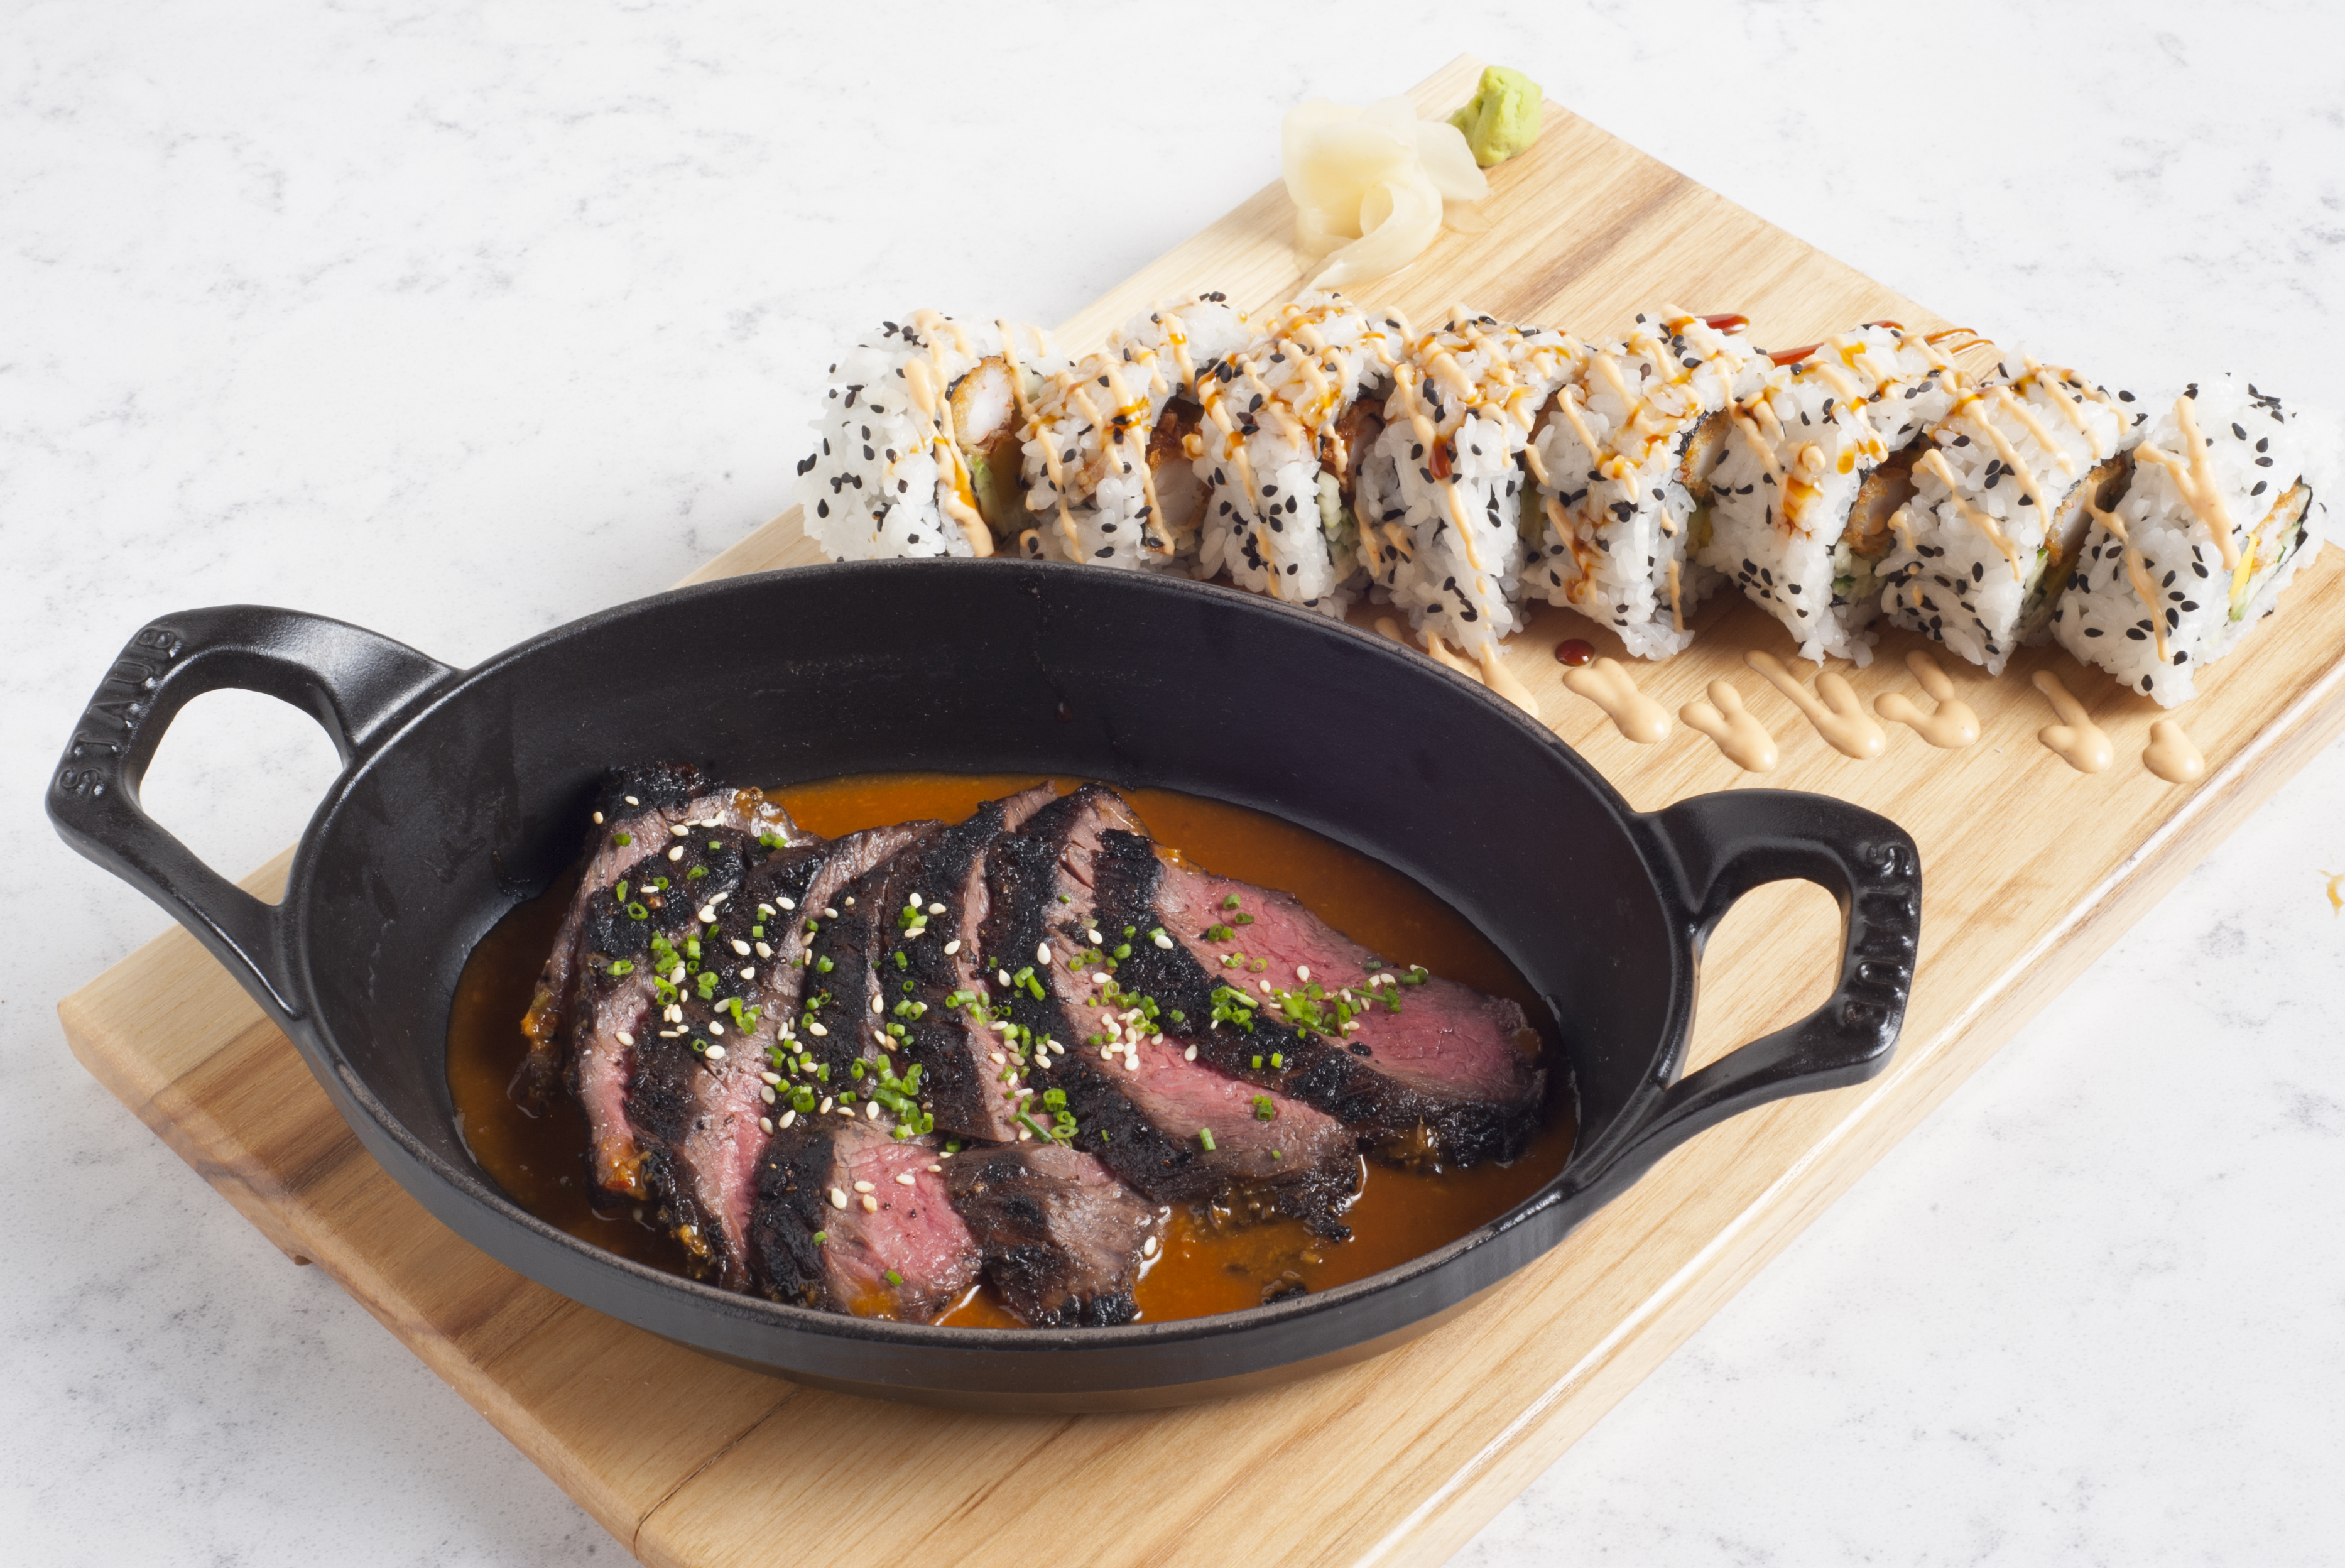 Steak and sushi at Earls Kitchen + Bar